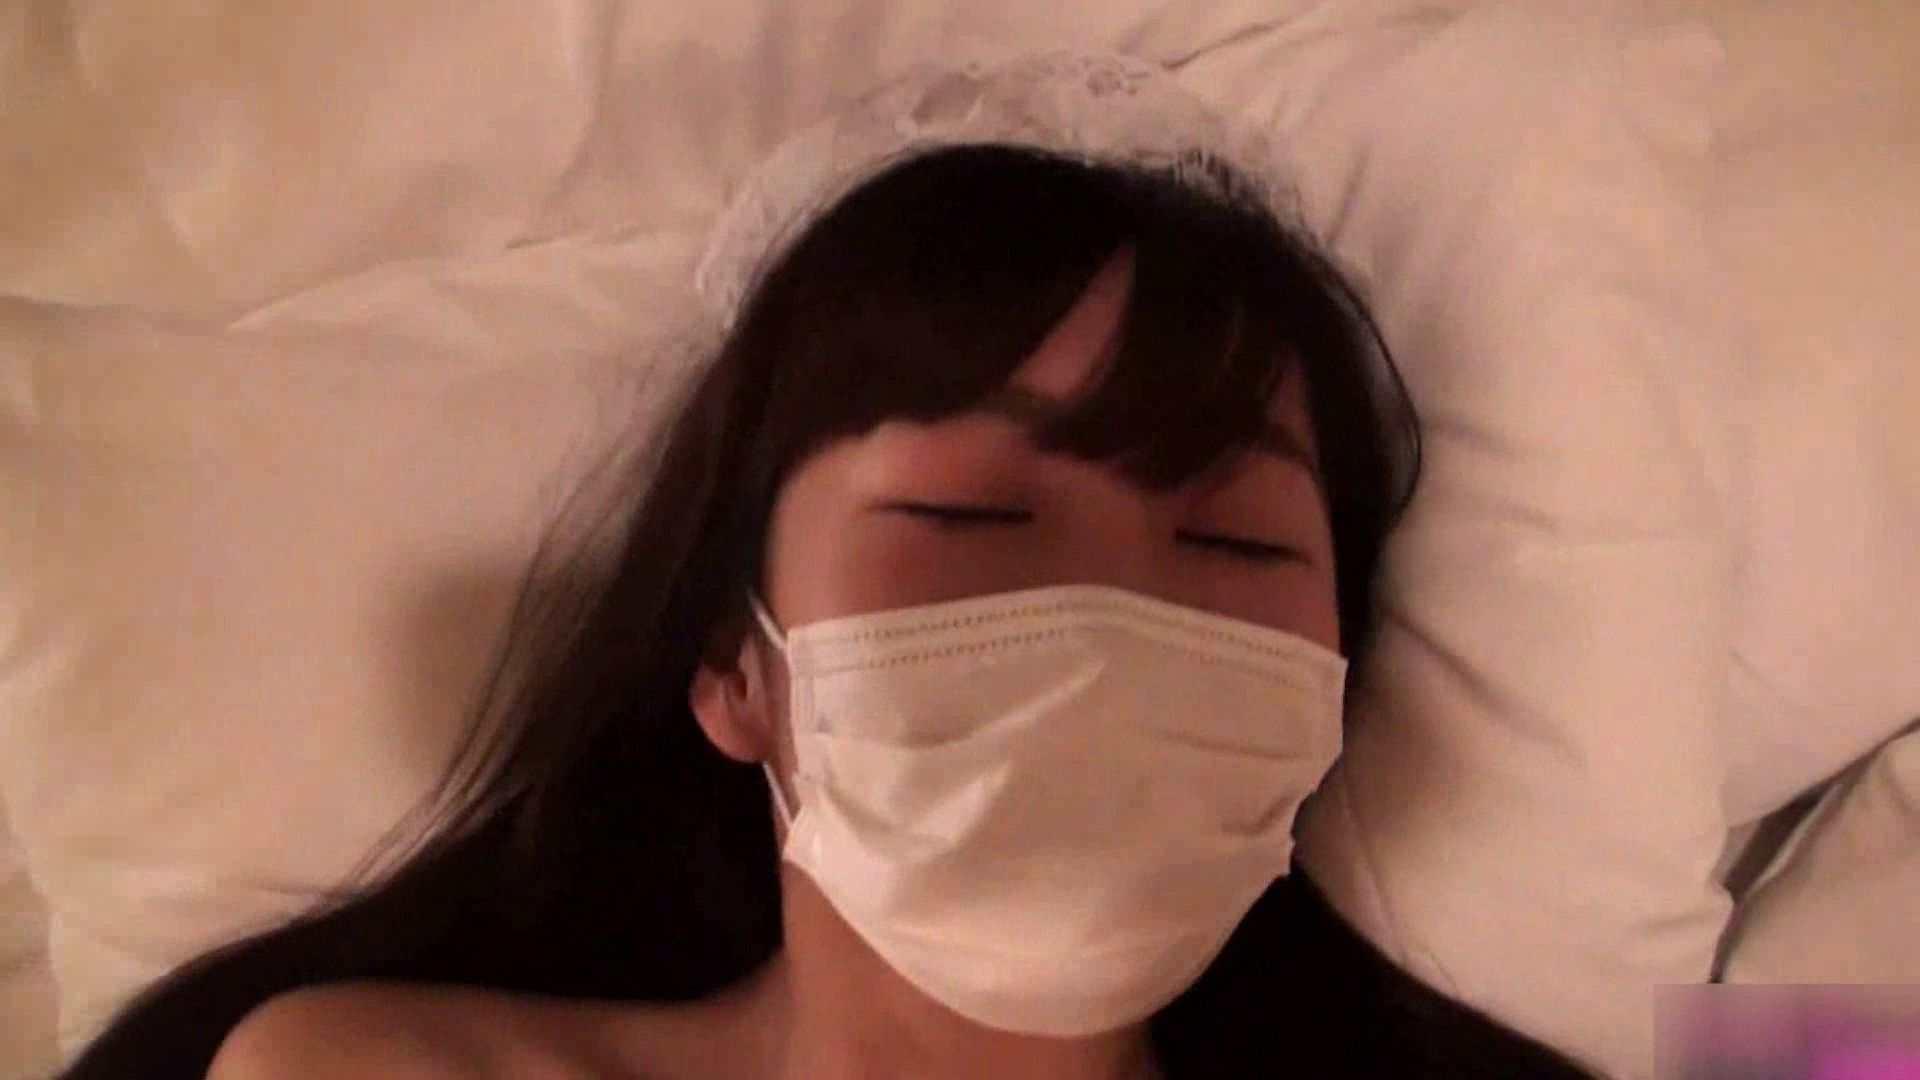 S級厳選美女ビッチガールVol.23 セックス  103枚 18